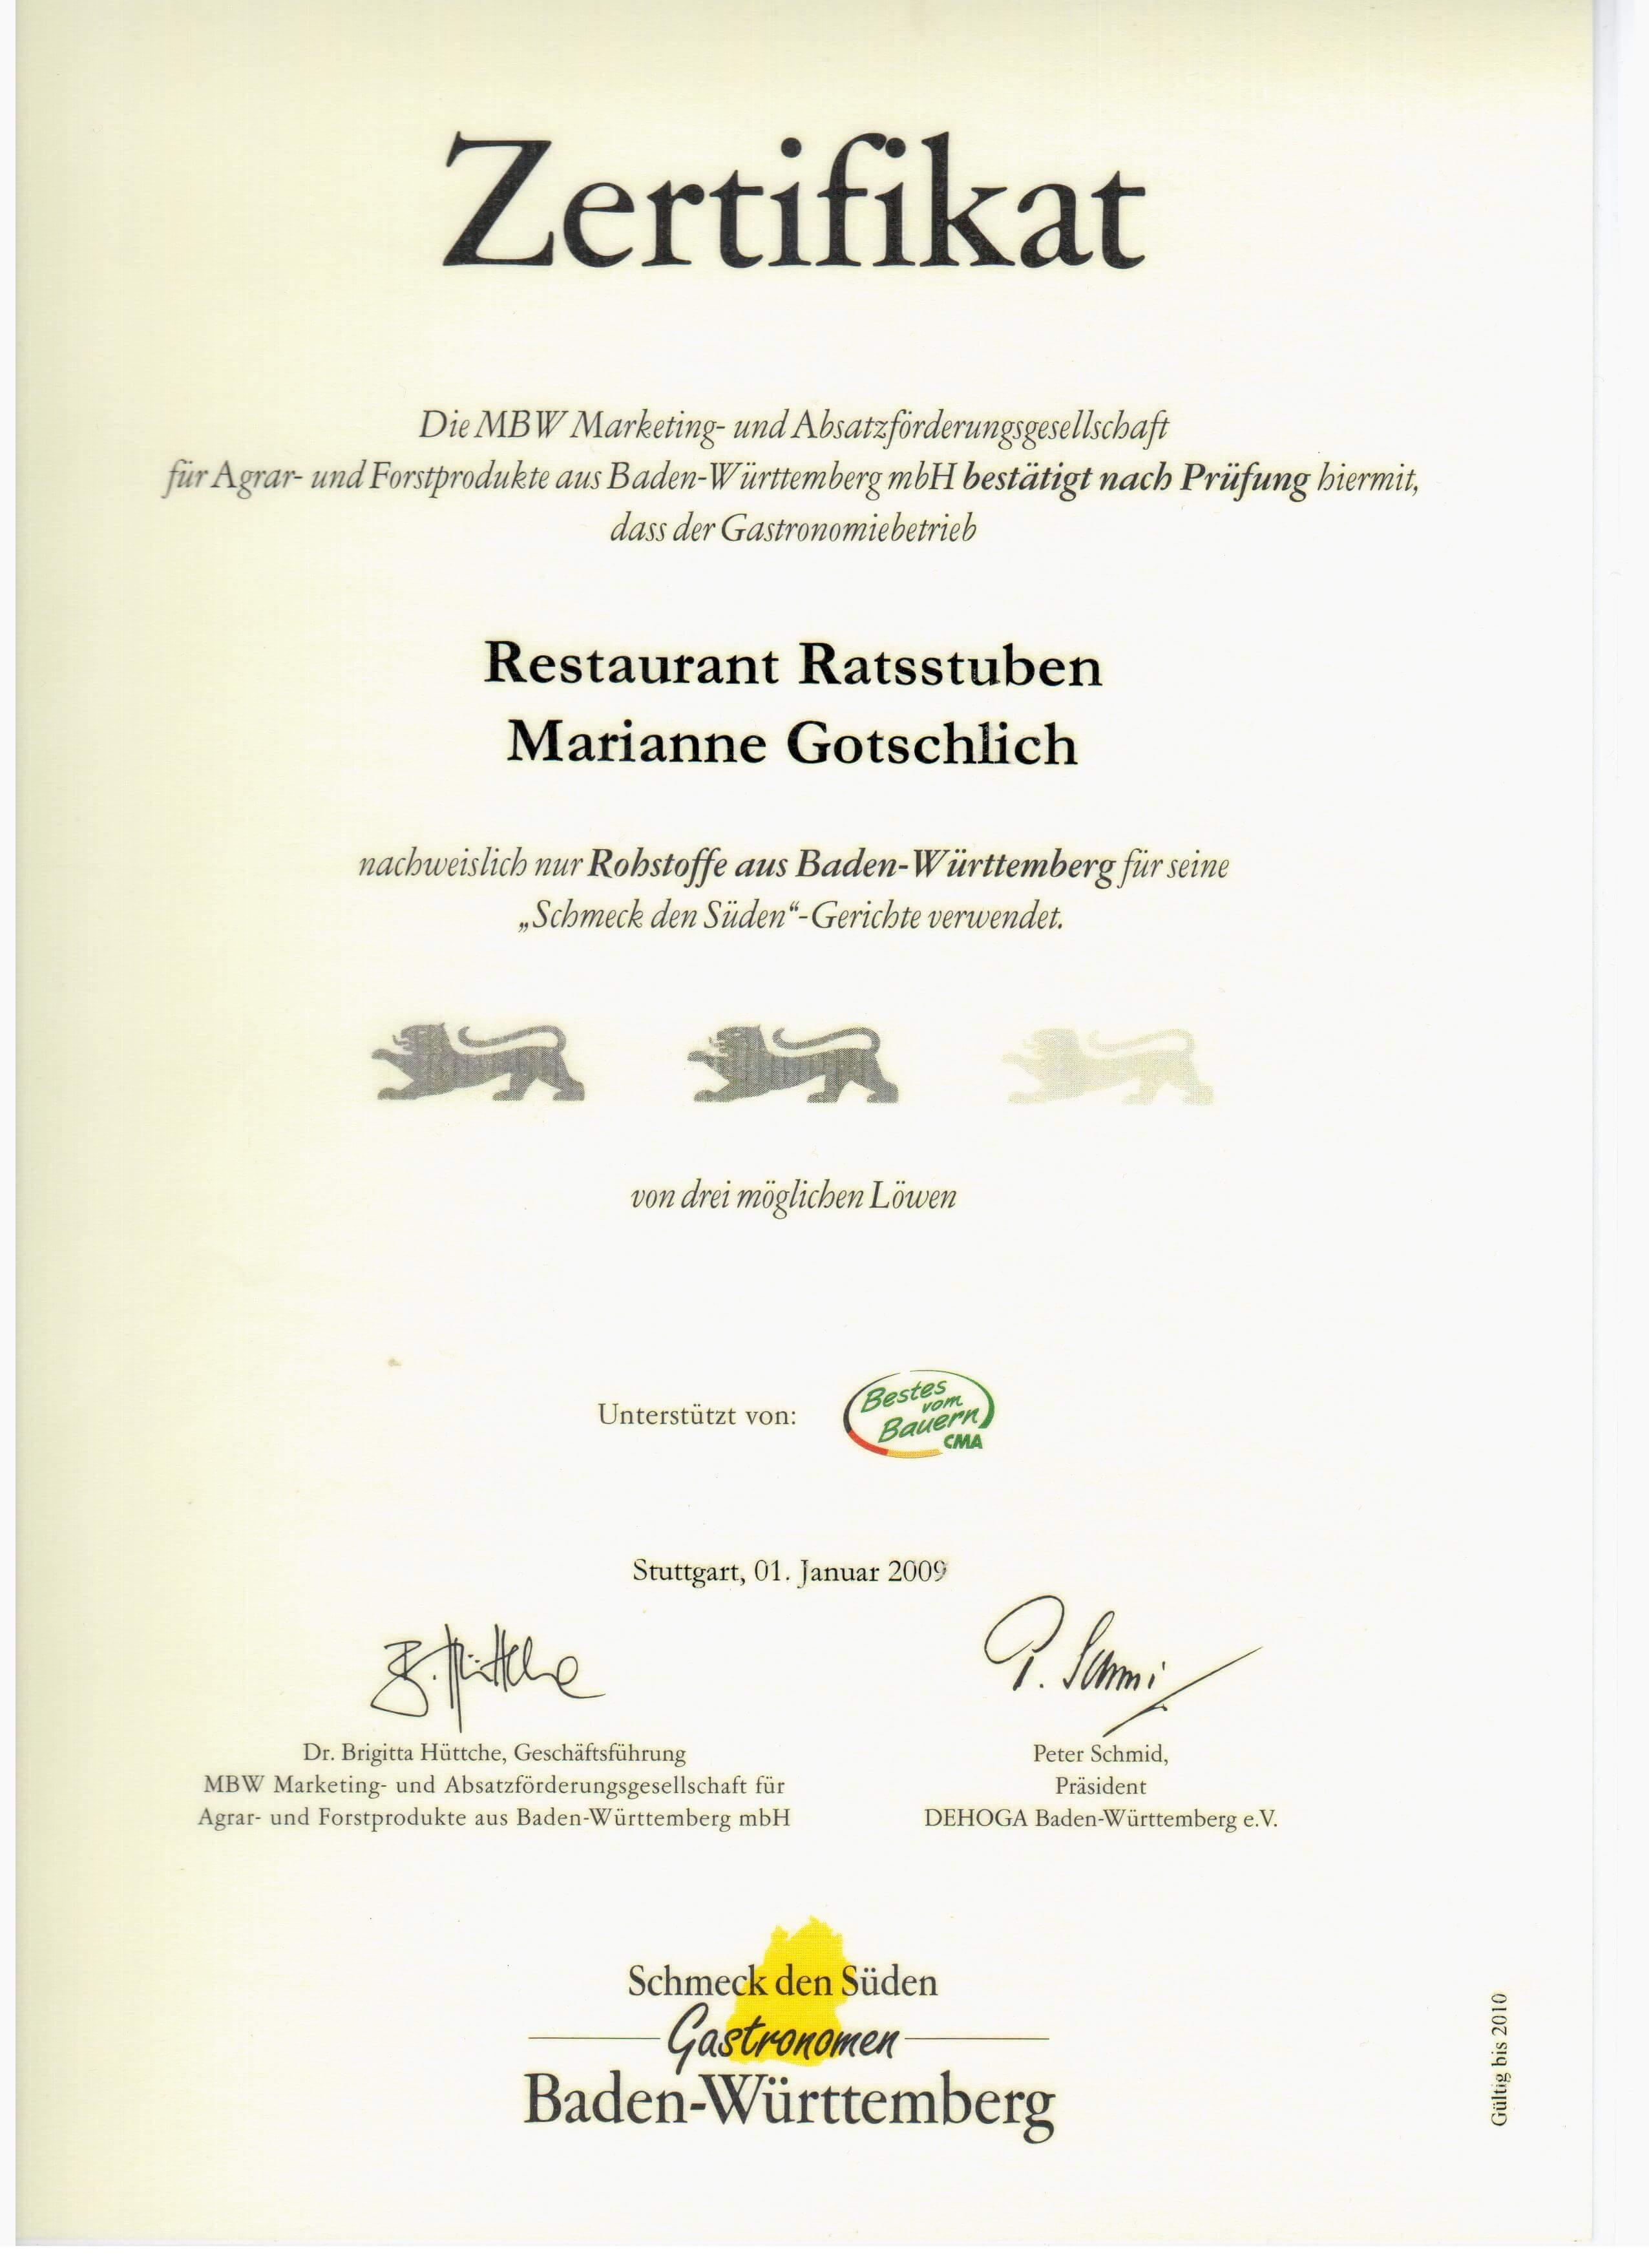 Zertifikat - restaurant Ratsstuben - Schmeck den Süden groß